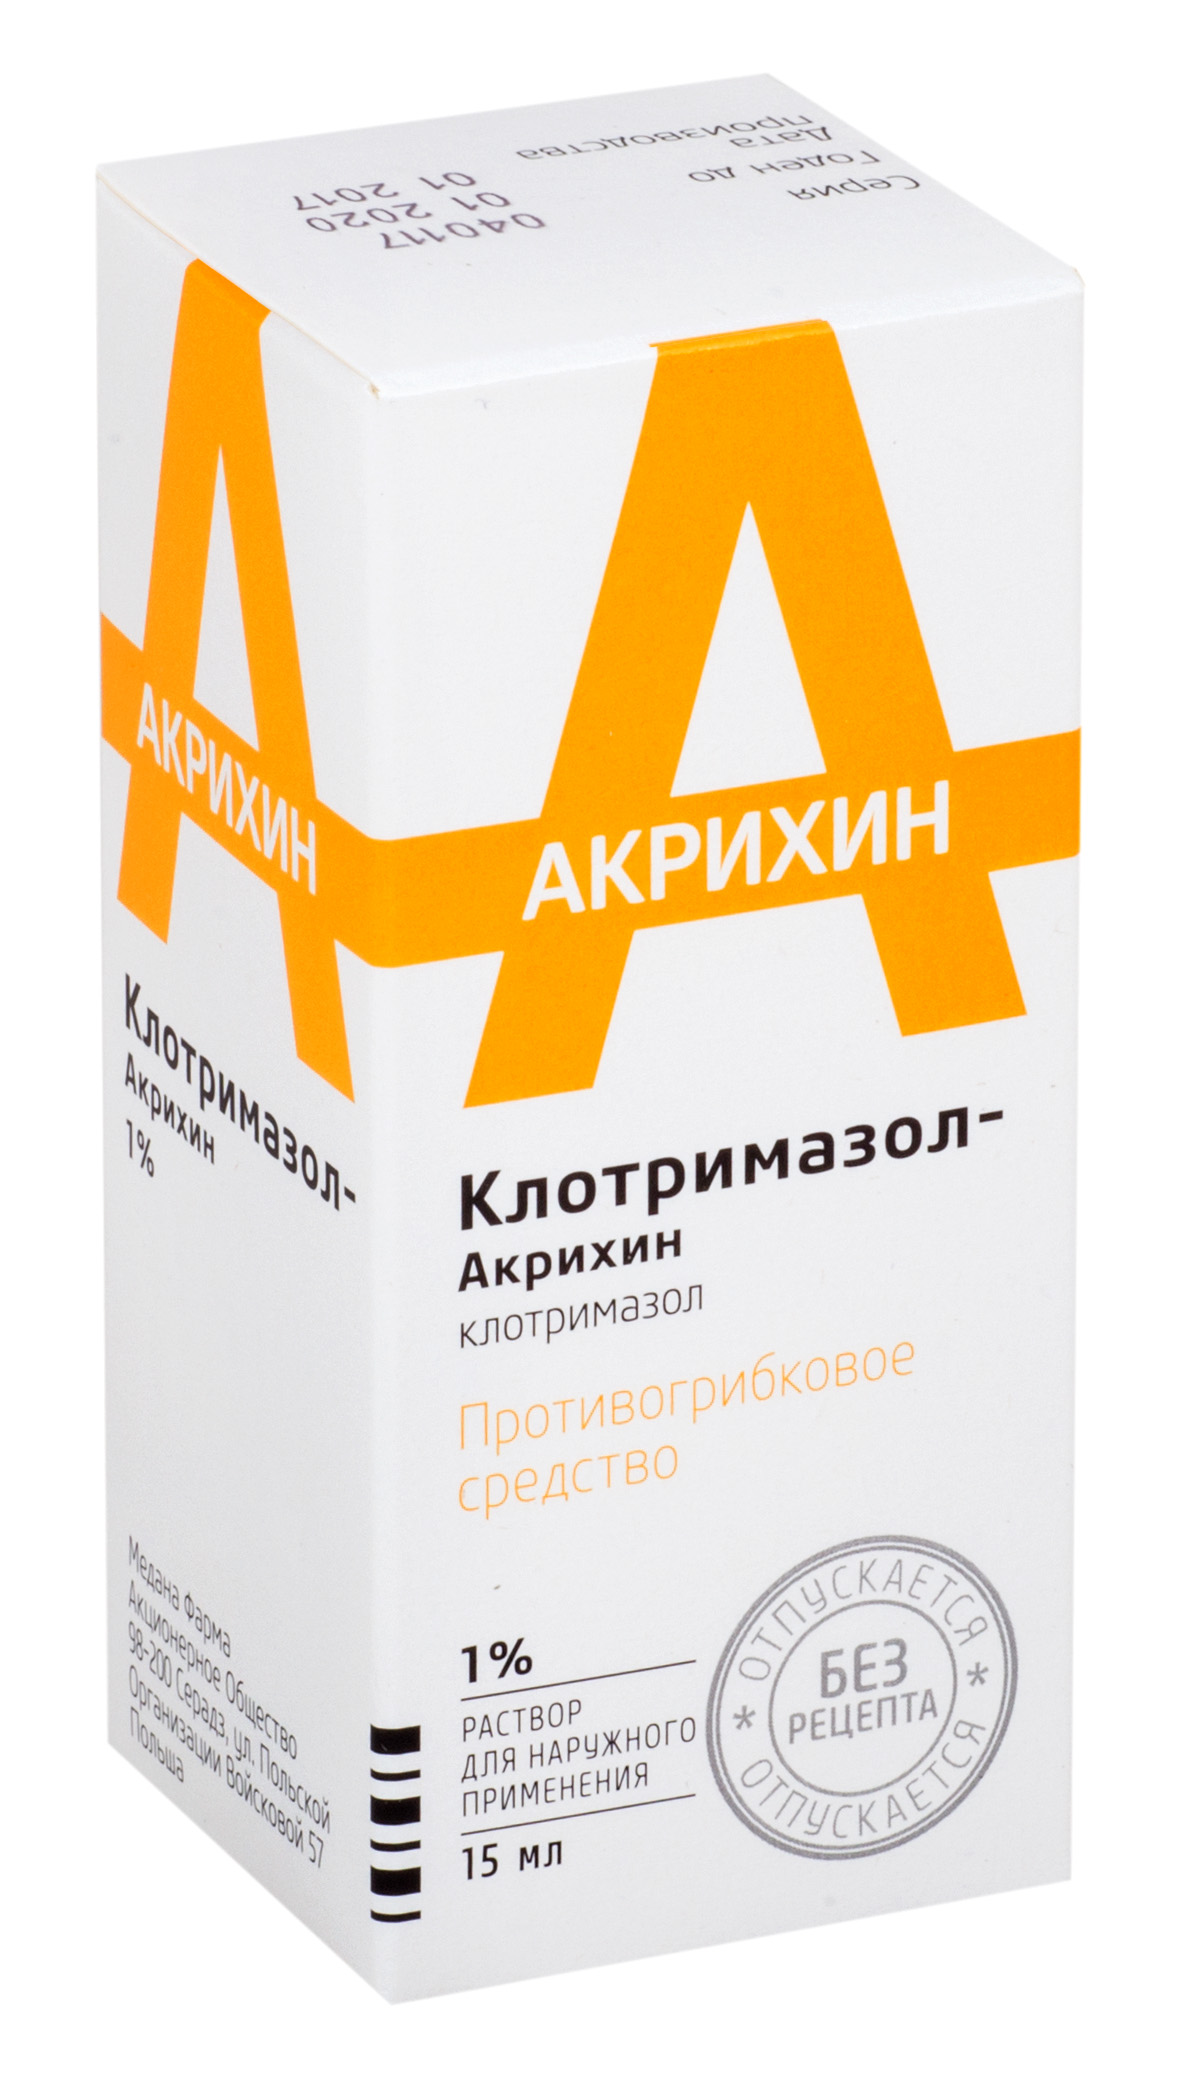 Клотримазол-акрихин р-р д/нар. прим. 1% фл. 15мл